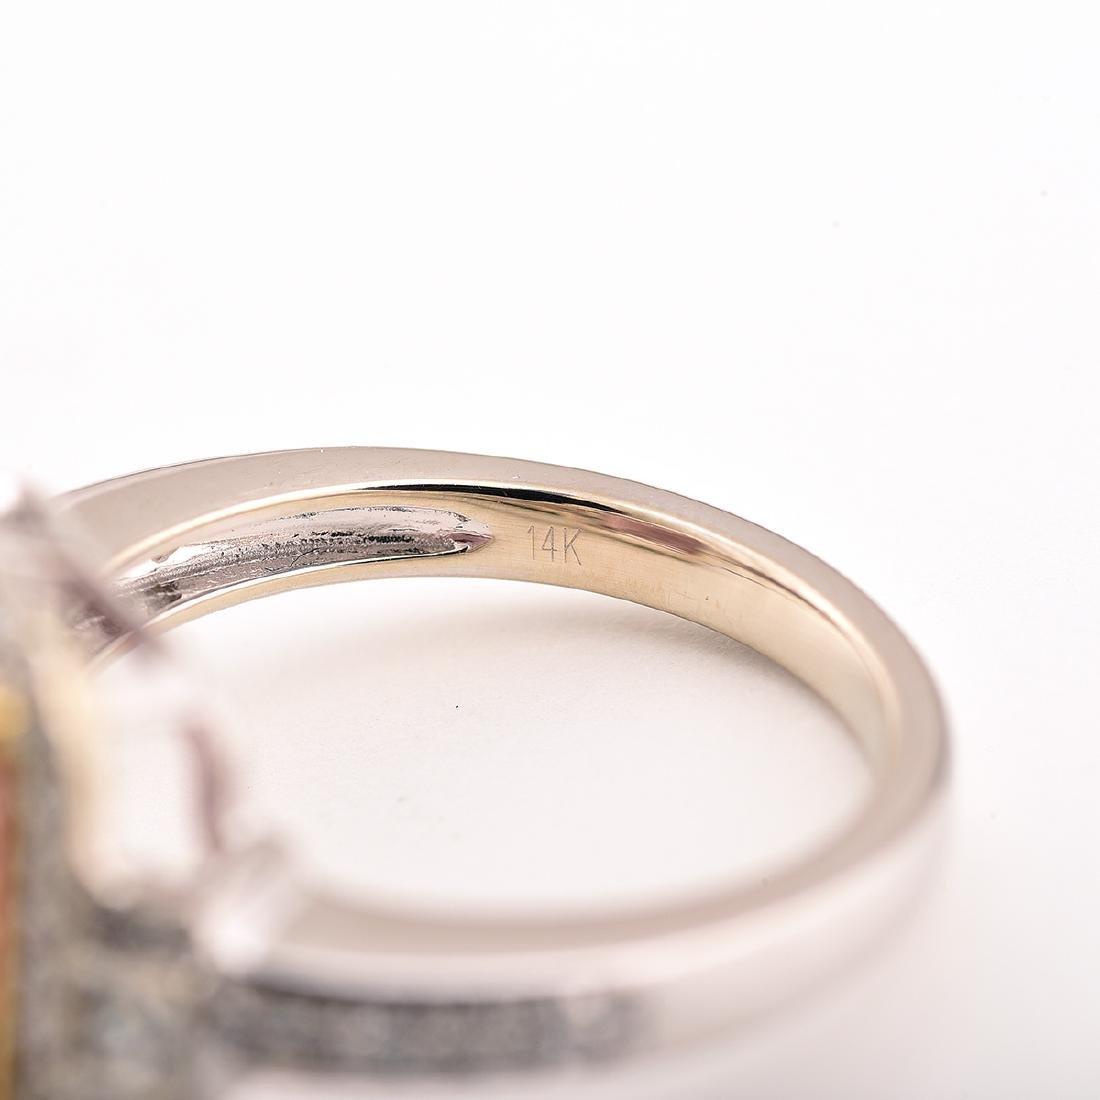 Tourmaline, Diamond, 14k Gold Ring. - 4